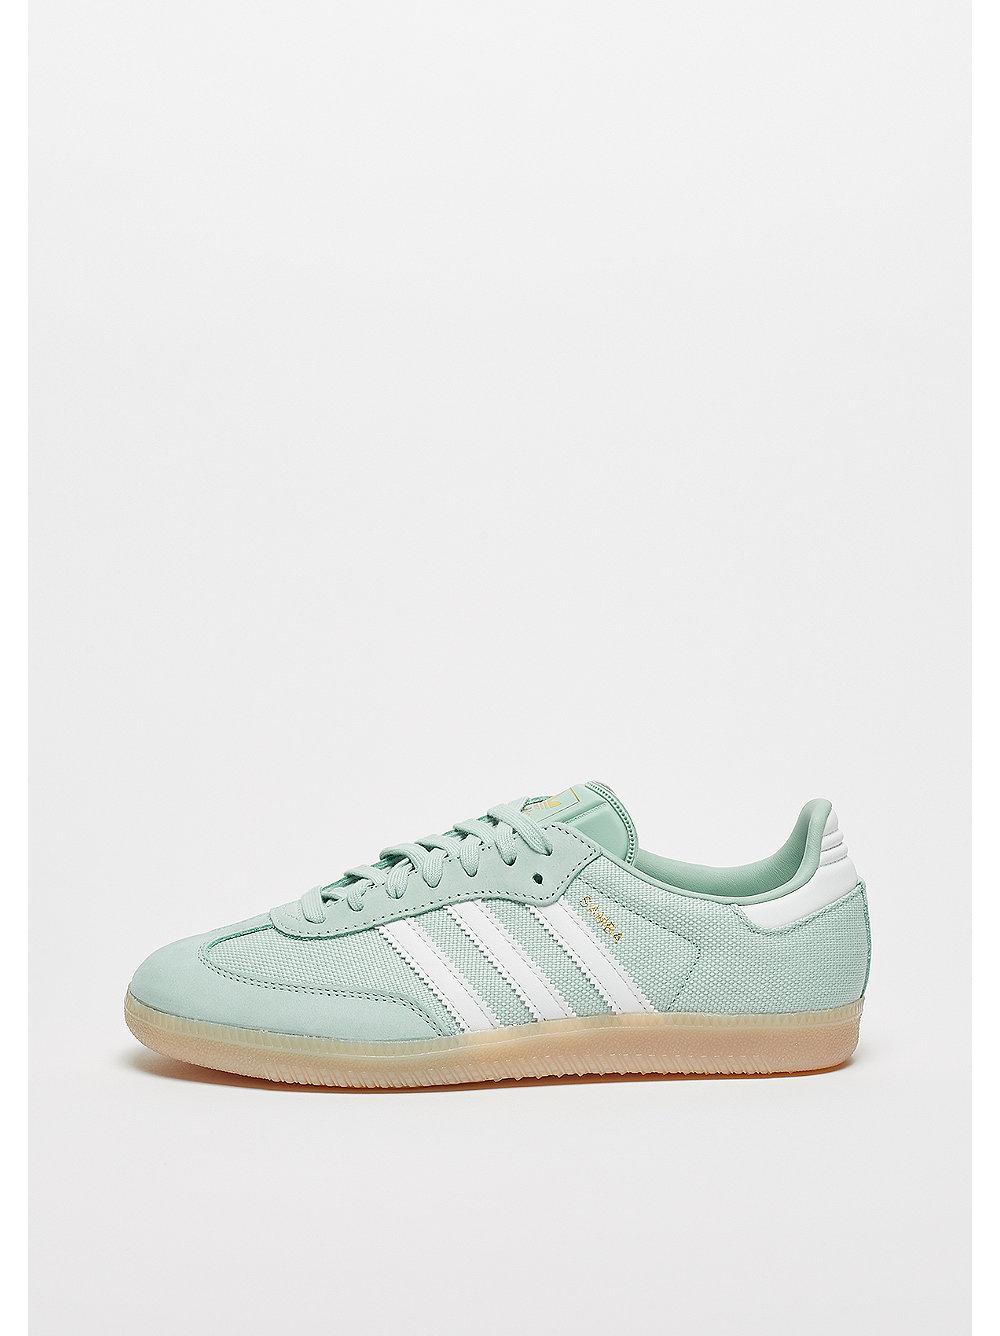 adidas Samba ash green-crystal white-linen